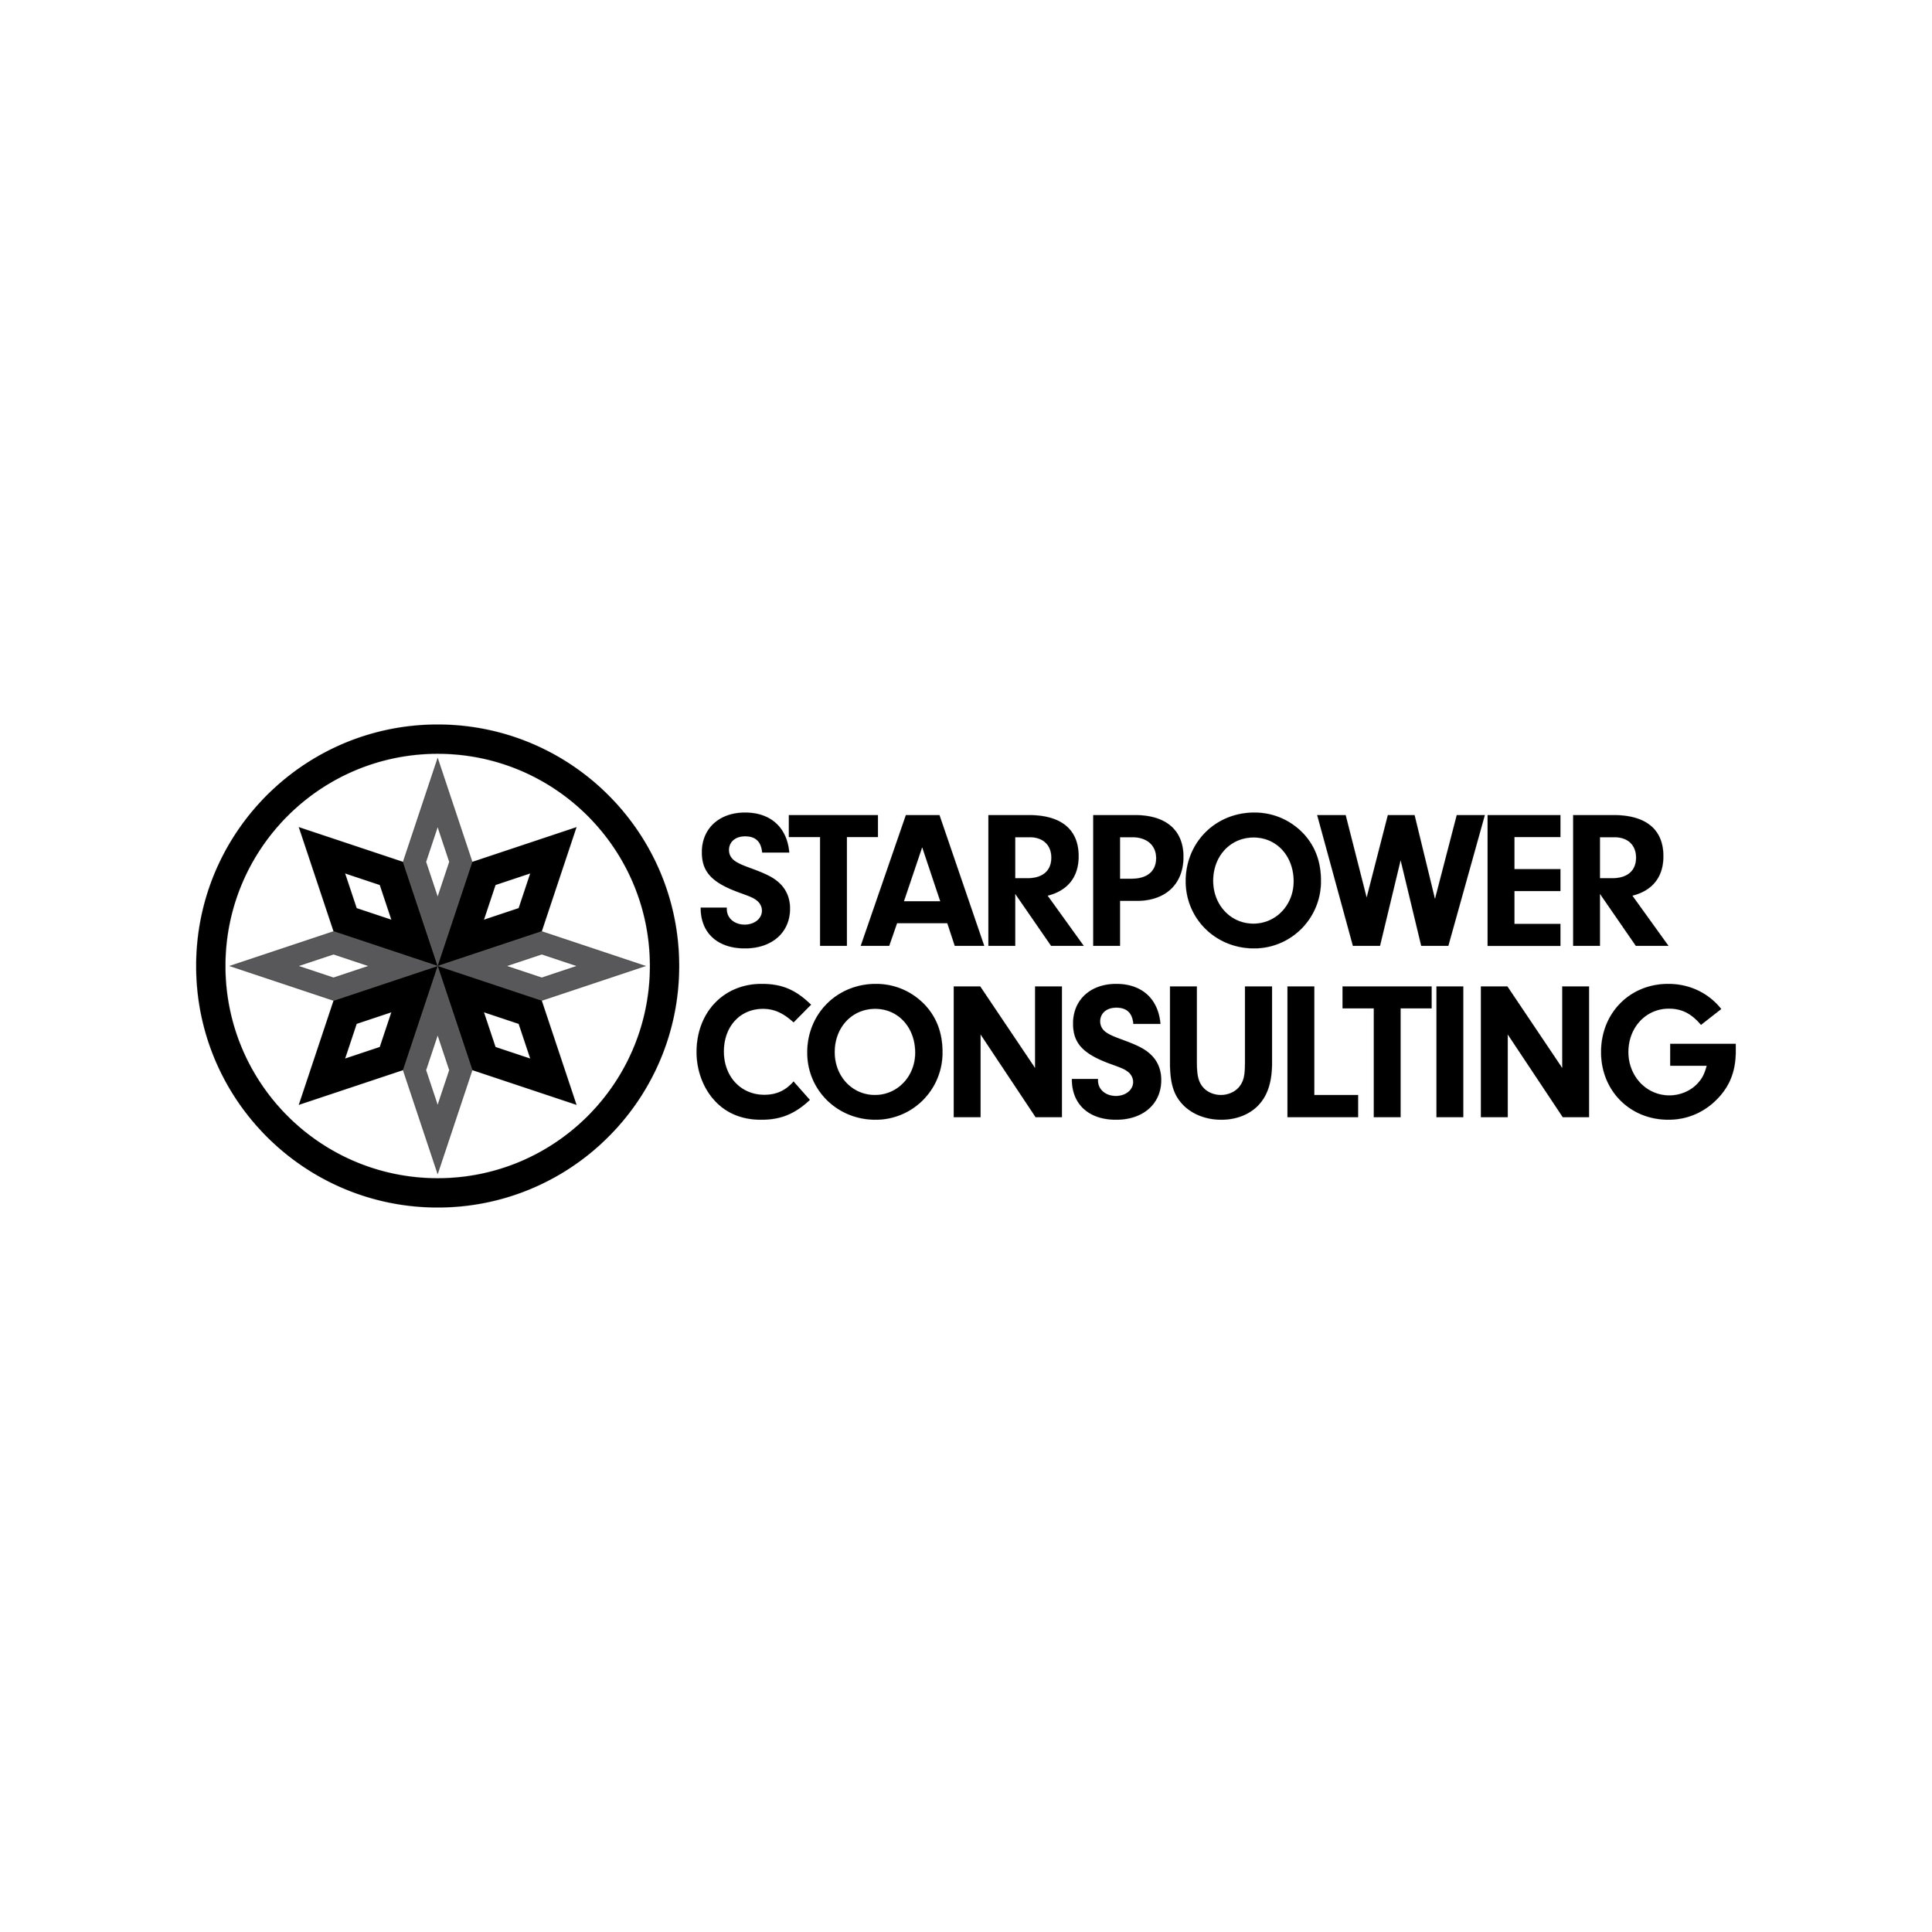 Starpower Consulting